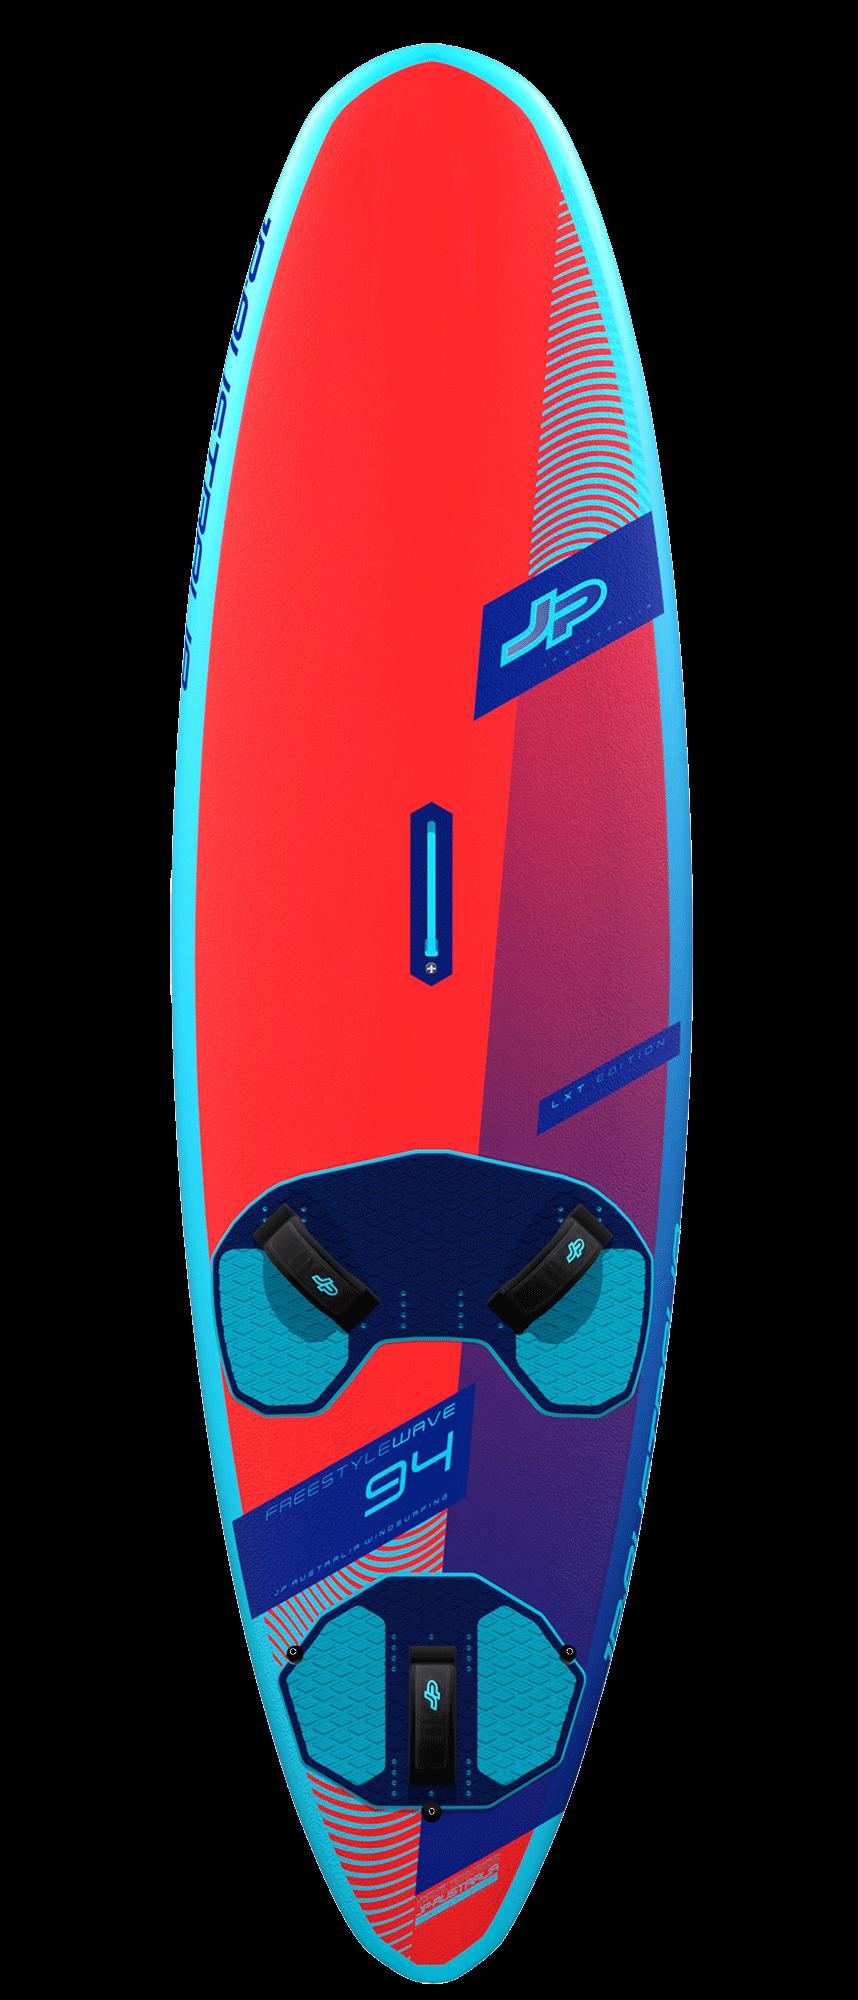 JP Freestyle Wave LXT 2021